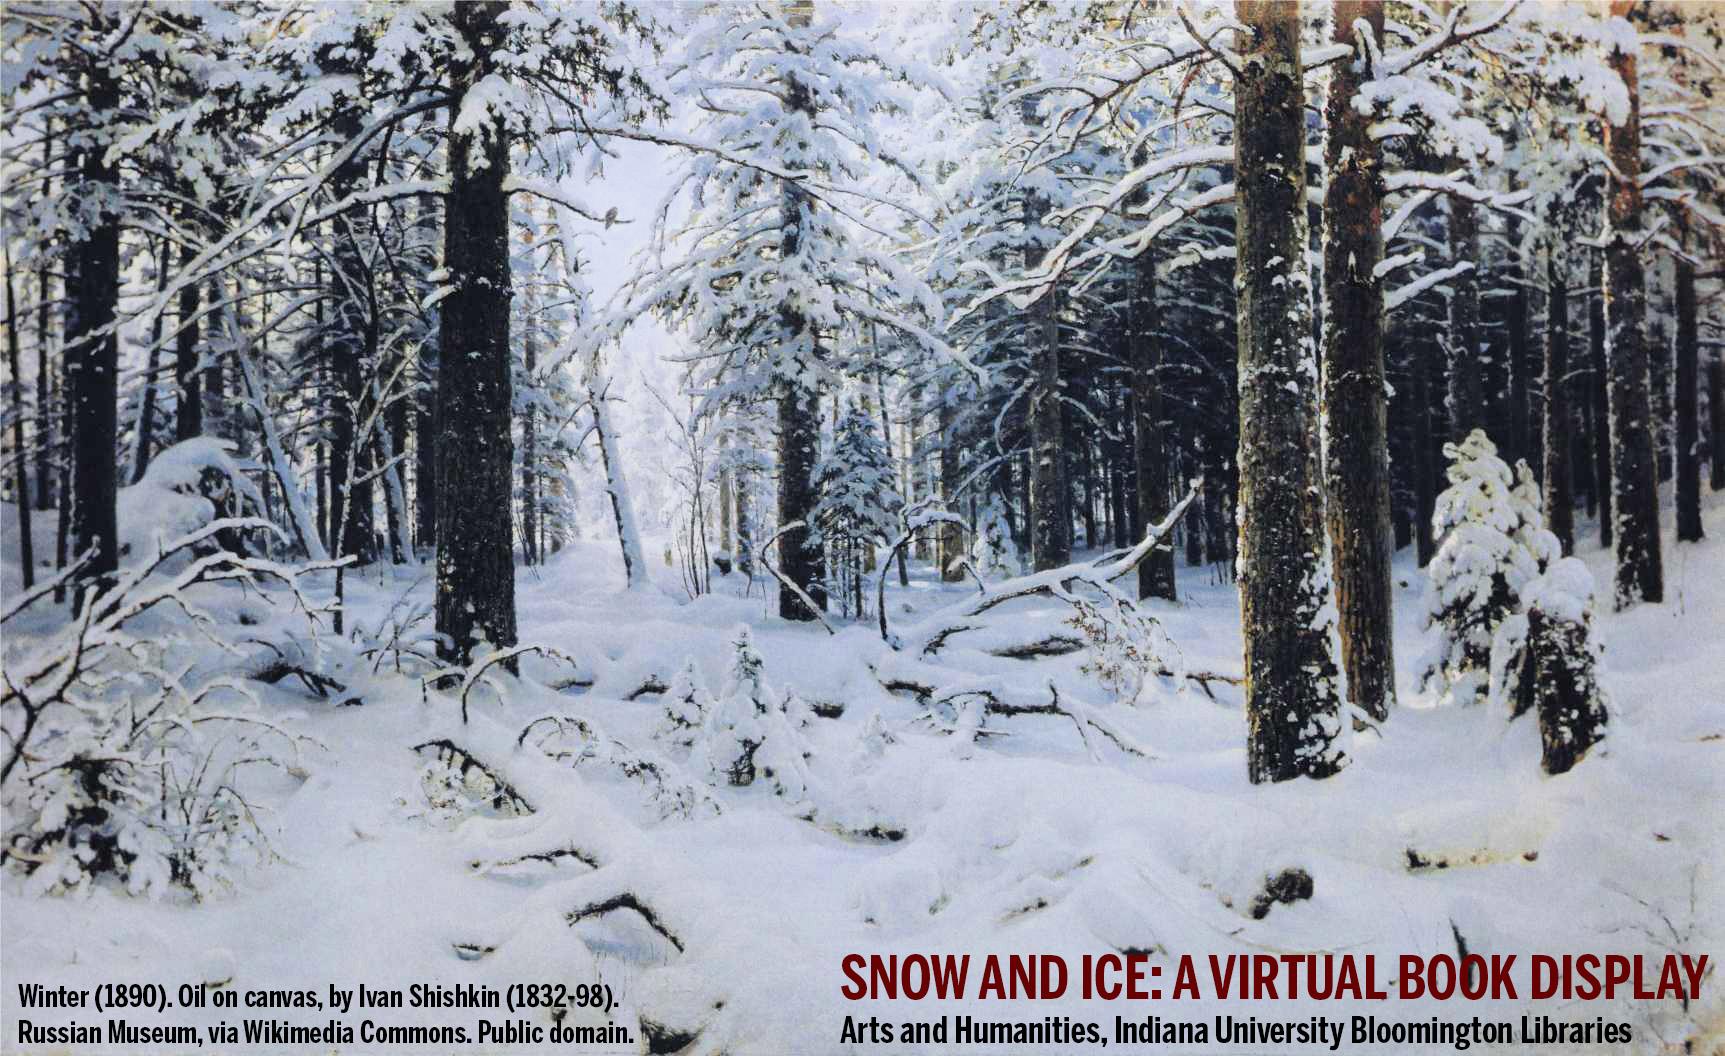 Snow and ice: a virtual book display. Winter (1890), by Ivan Shishkin.